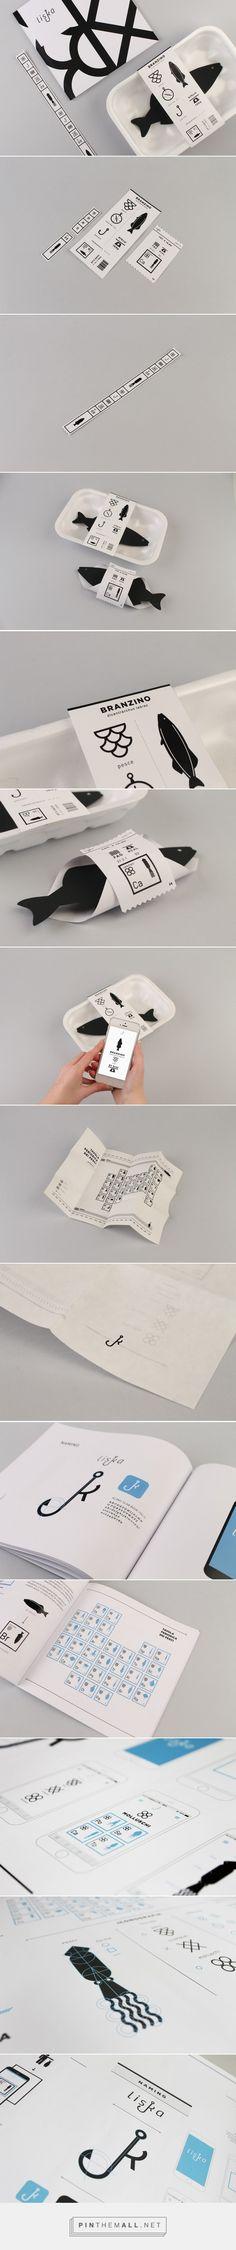 Liska Fish products packaging concept design by Stefania Borasca (Italy) - http://www.packagingoftheworld.com/2016/04/liska-student-project.html